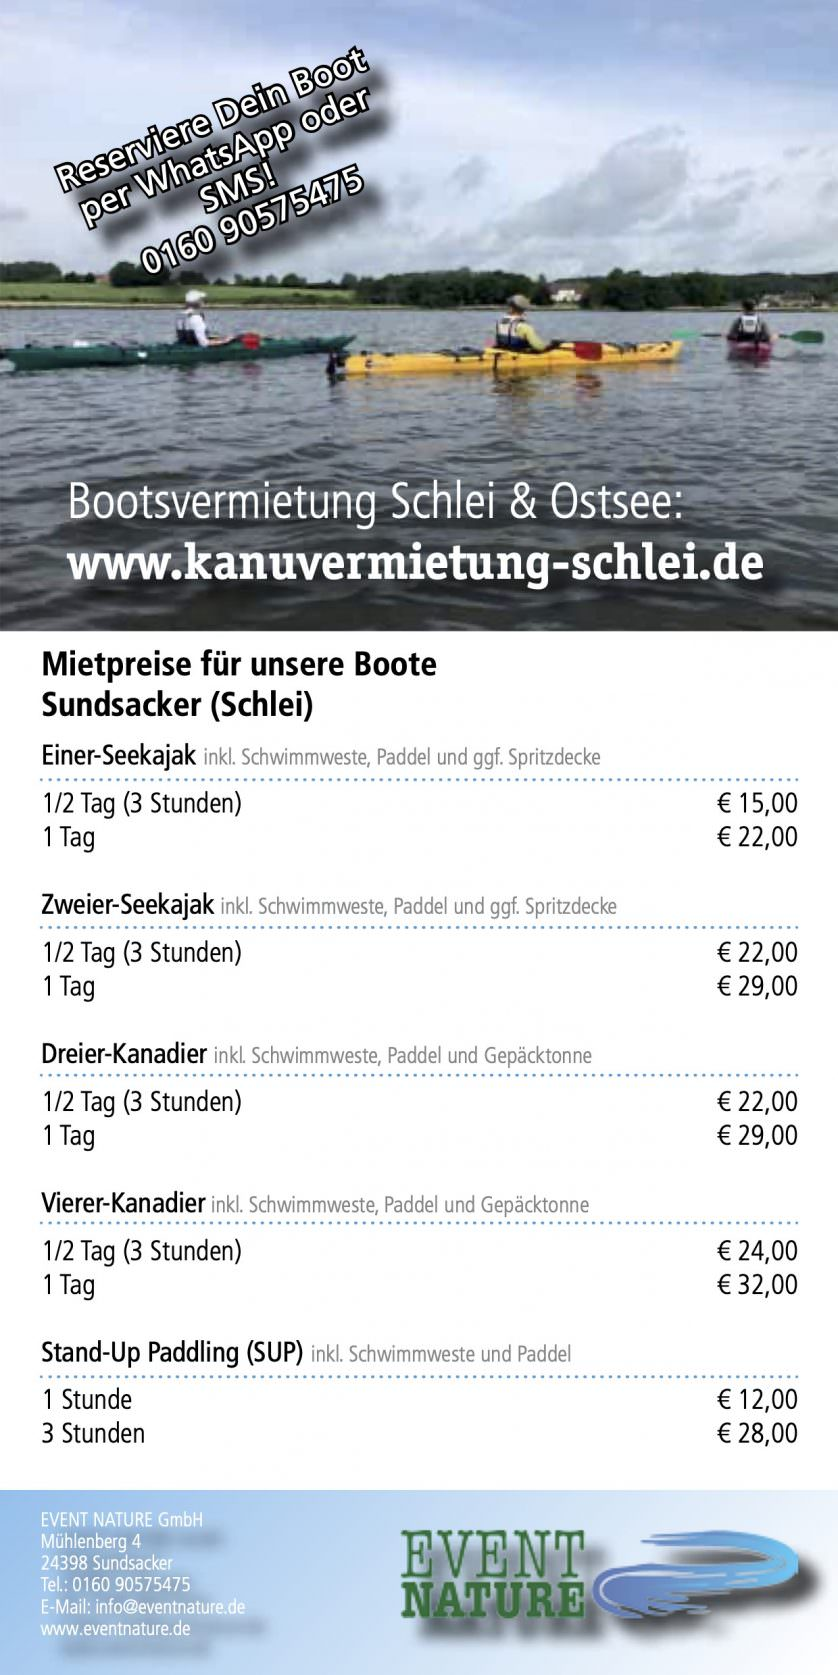 Kanuvermietung Schlei Flyer 2020 Event Nature Event Nature 838x1675 1